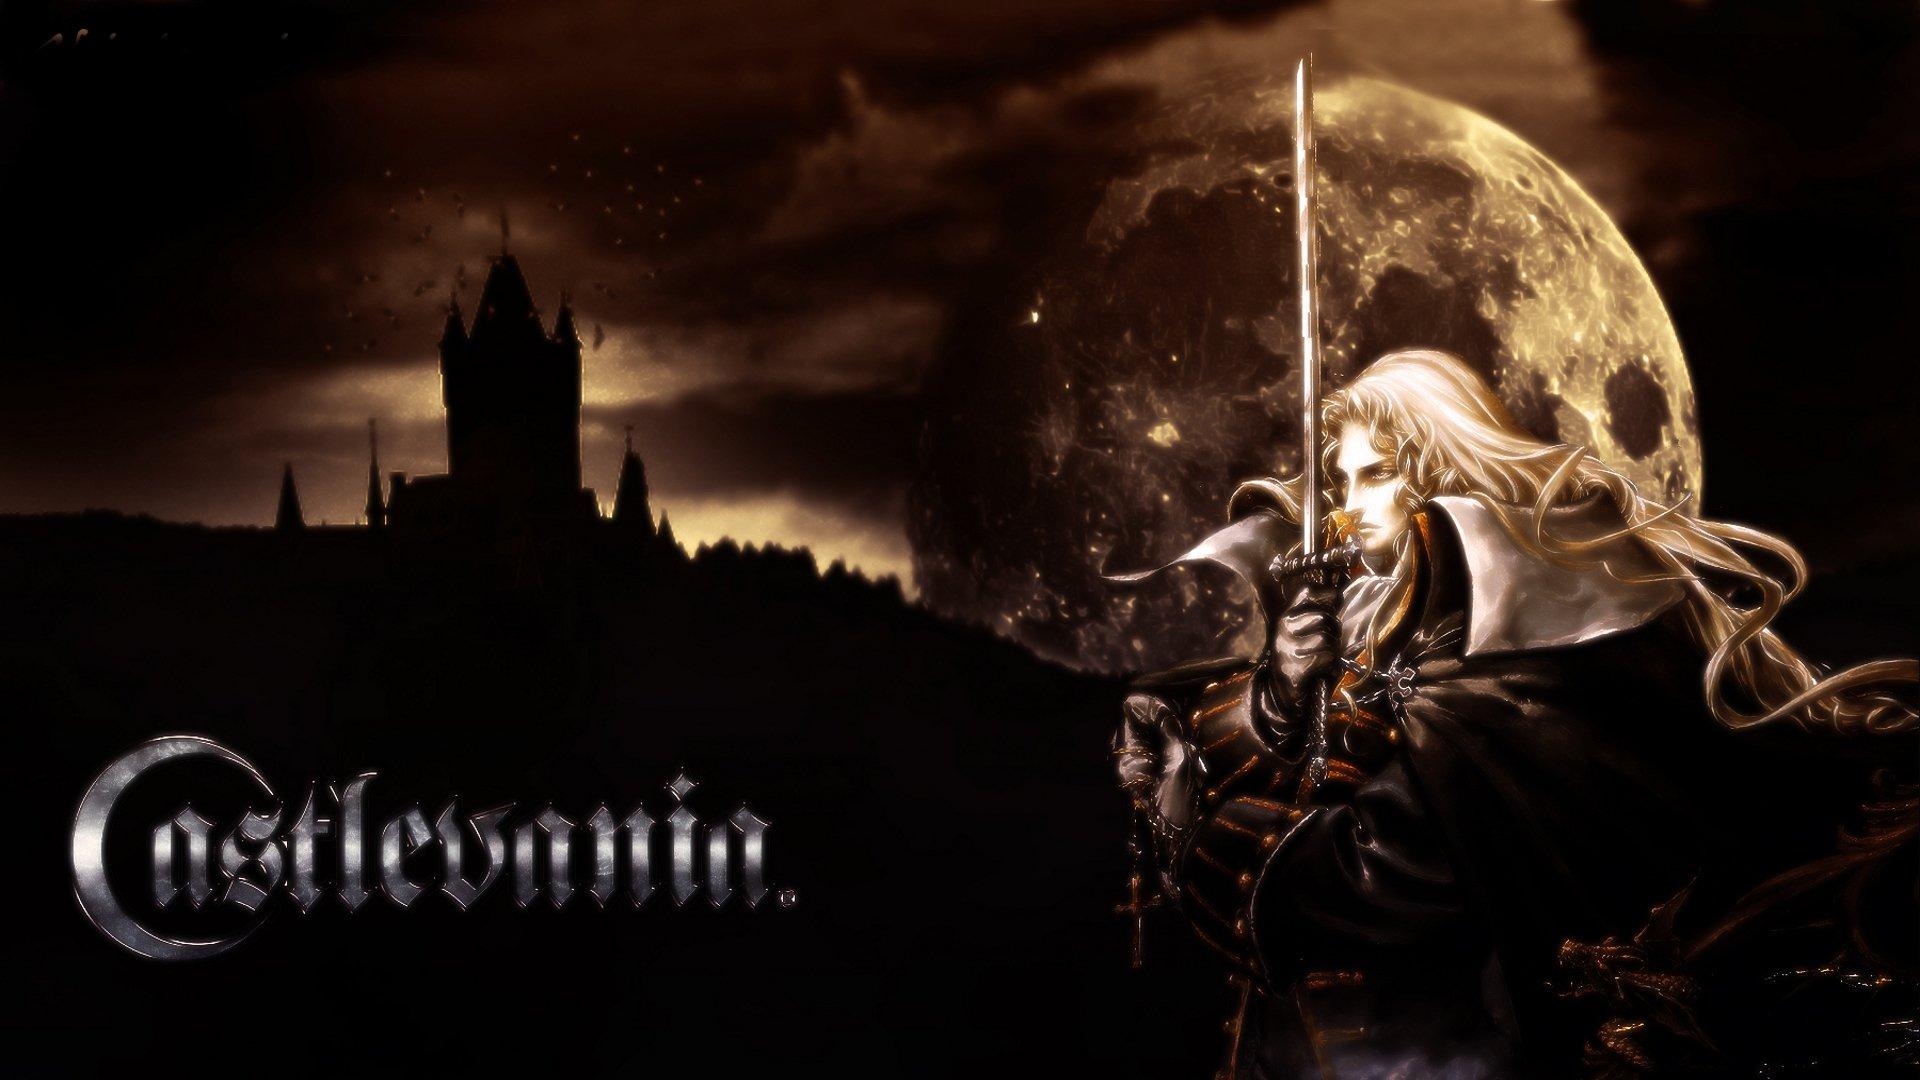 wallpaper : castlevania symphony of the night 1920x1080 - castlevian